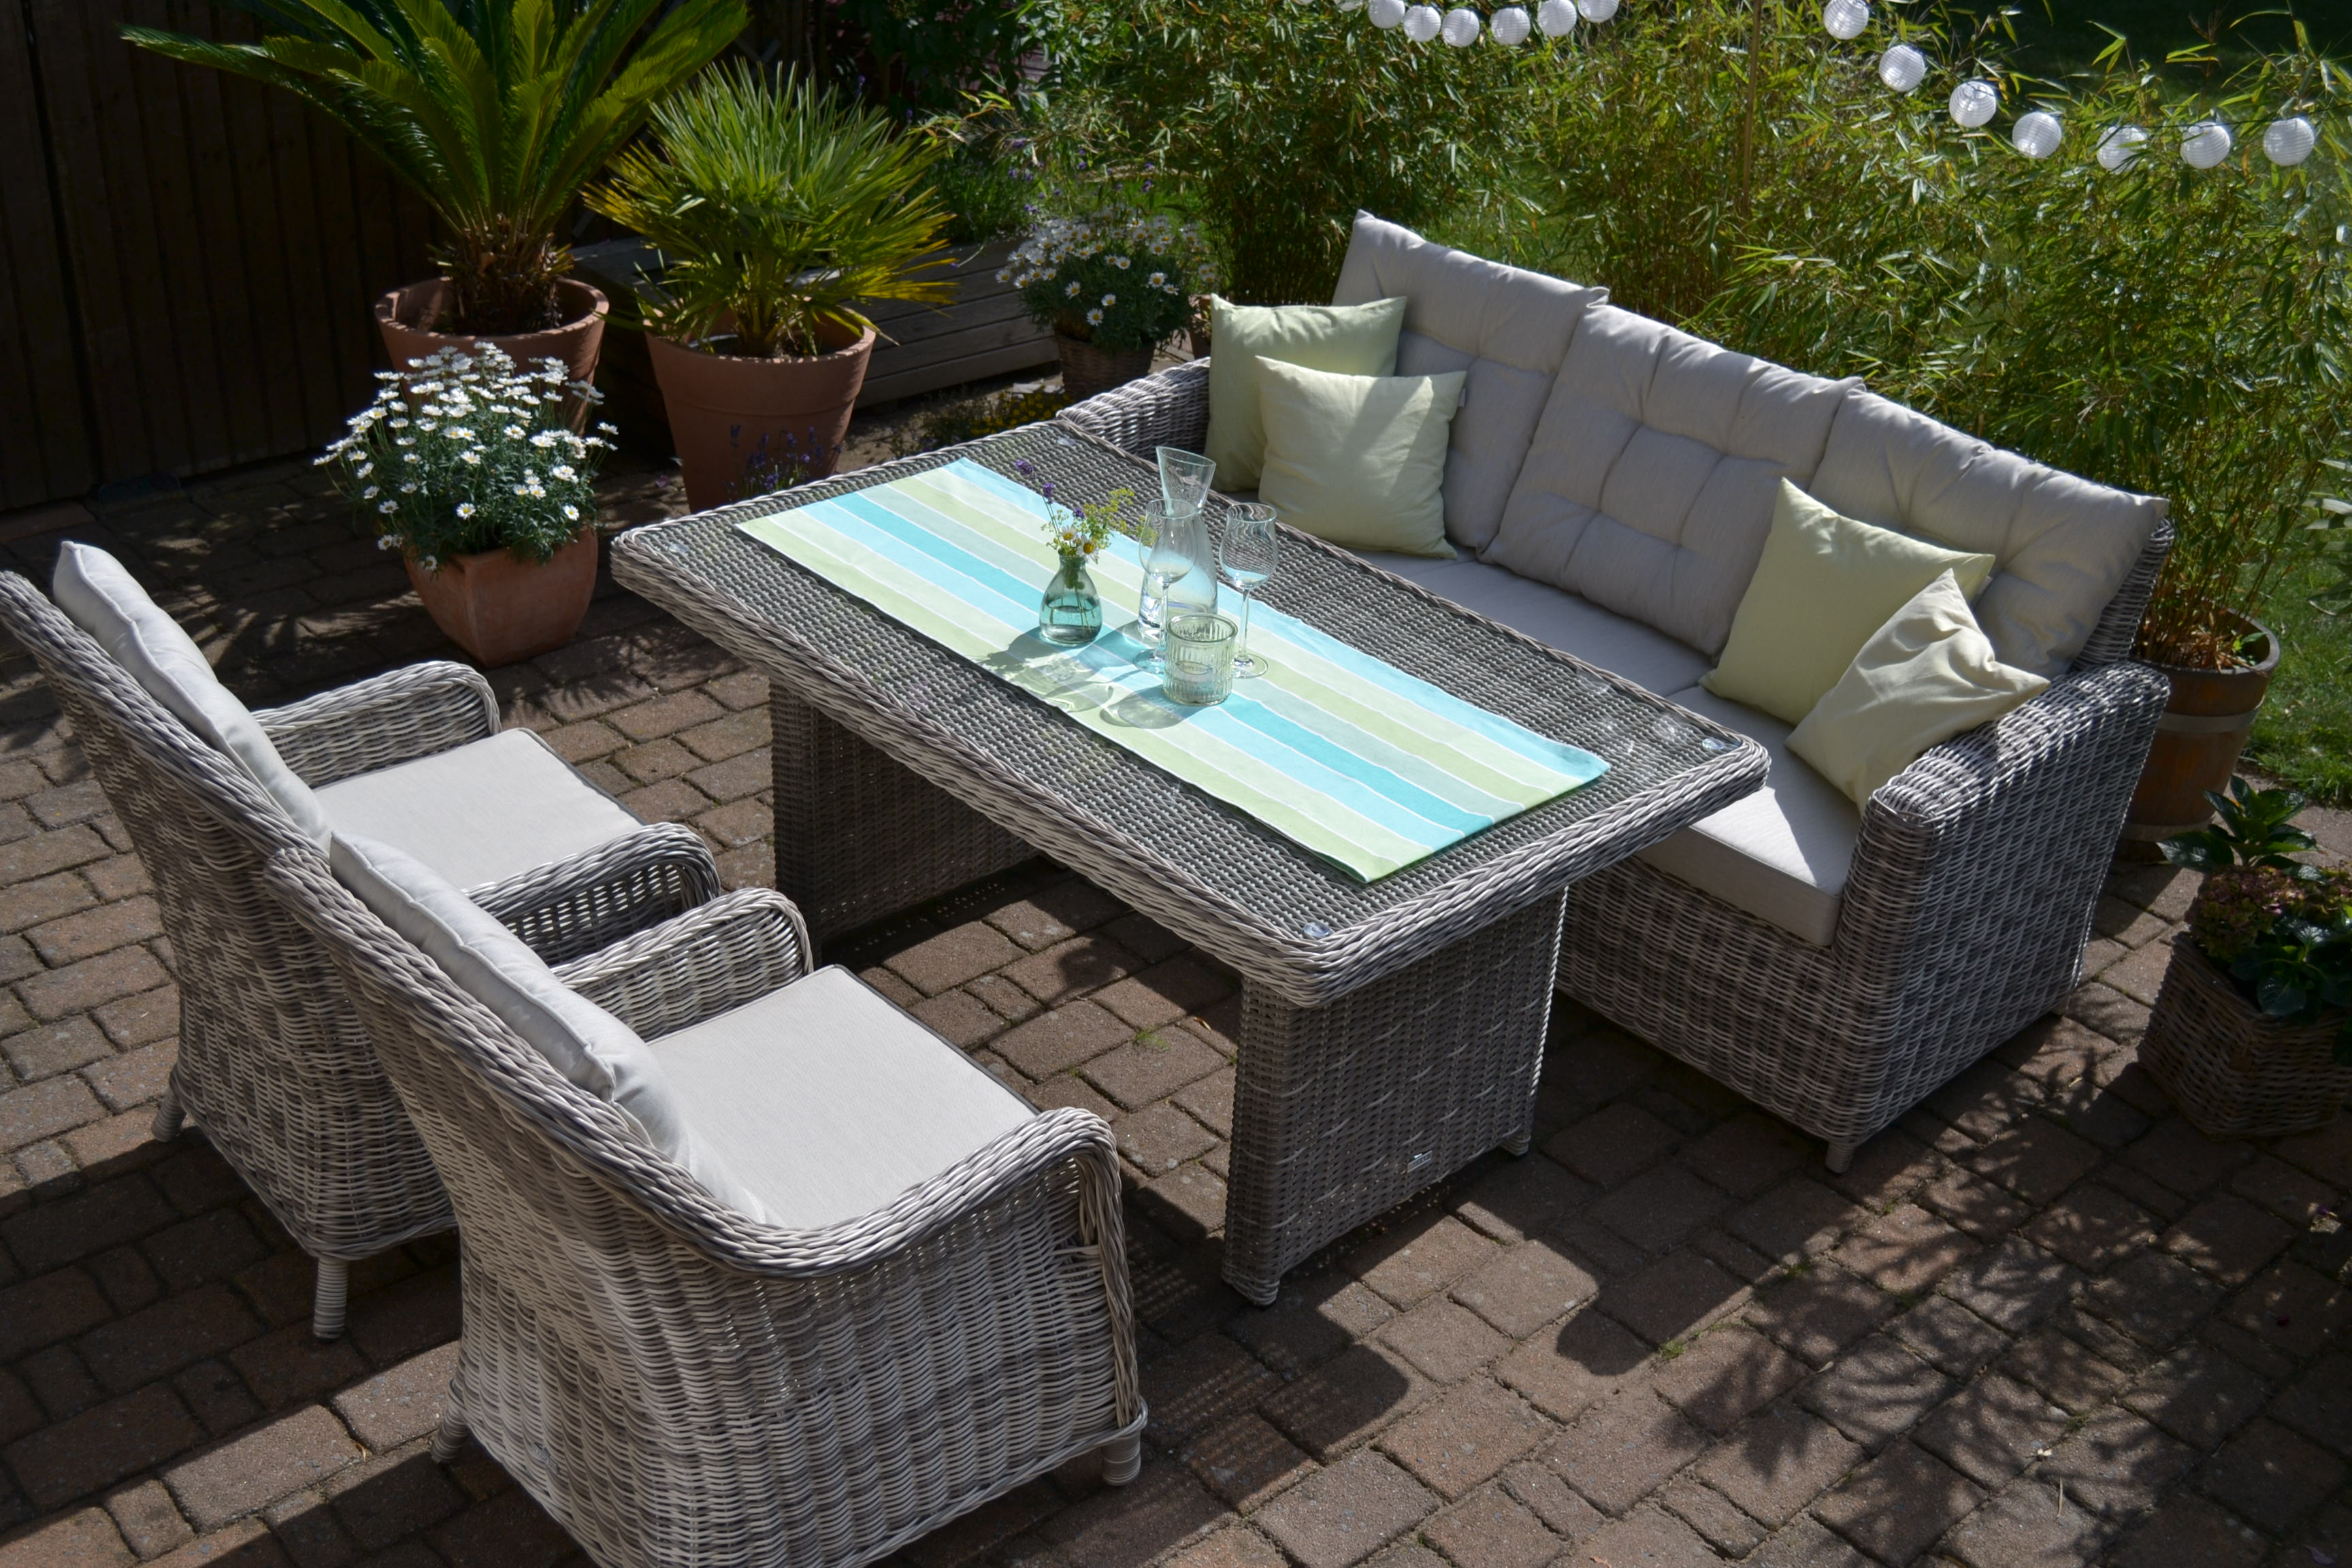 ecklounge sitzgruppe manhattan sand grau bomey handel gbr. Black Bedroom Furniture Sets. Home Design Ideas